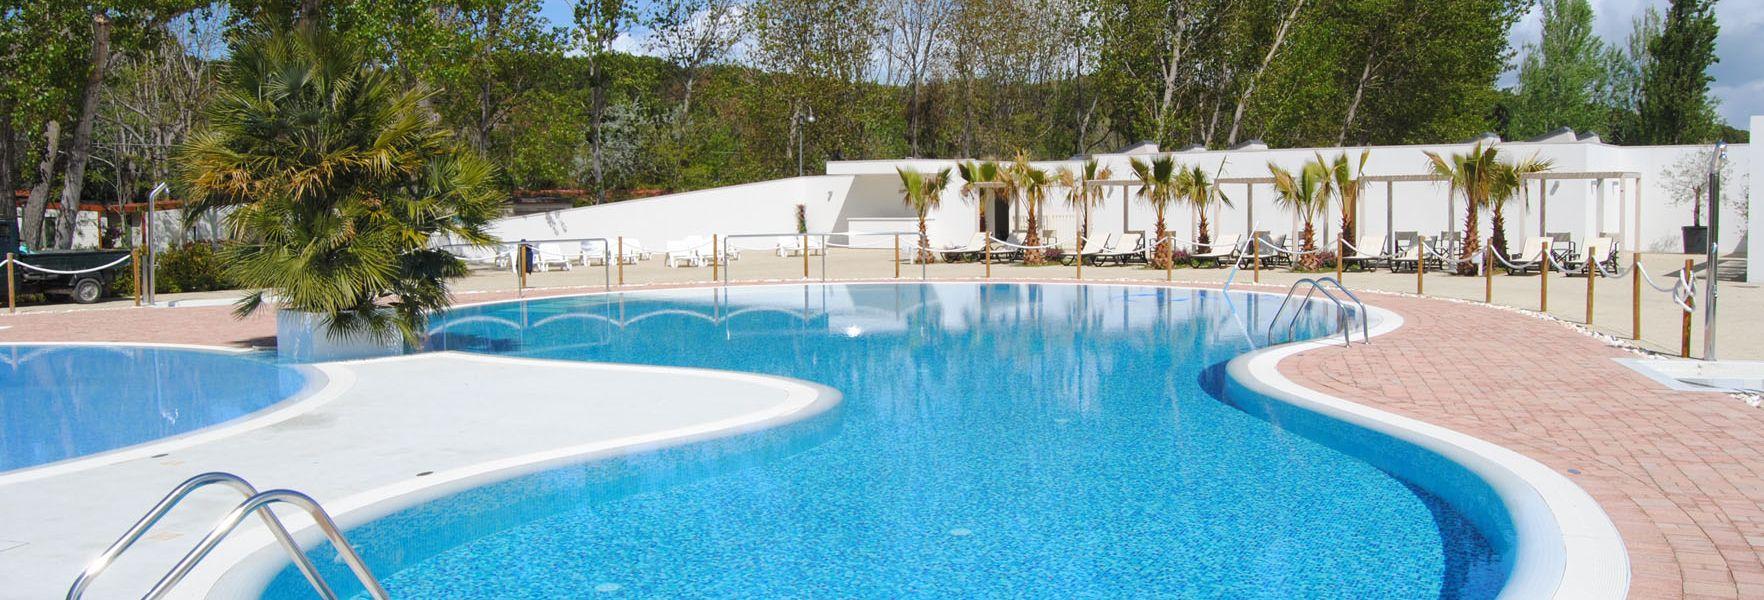 Camping village molino a fuoco in toscana camping village - Camping toscana con piscina ...